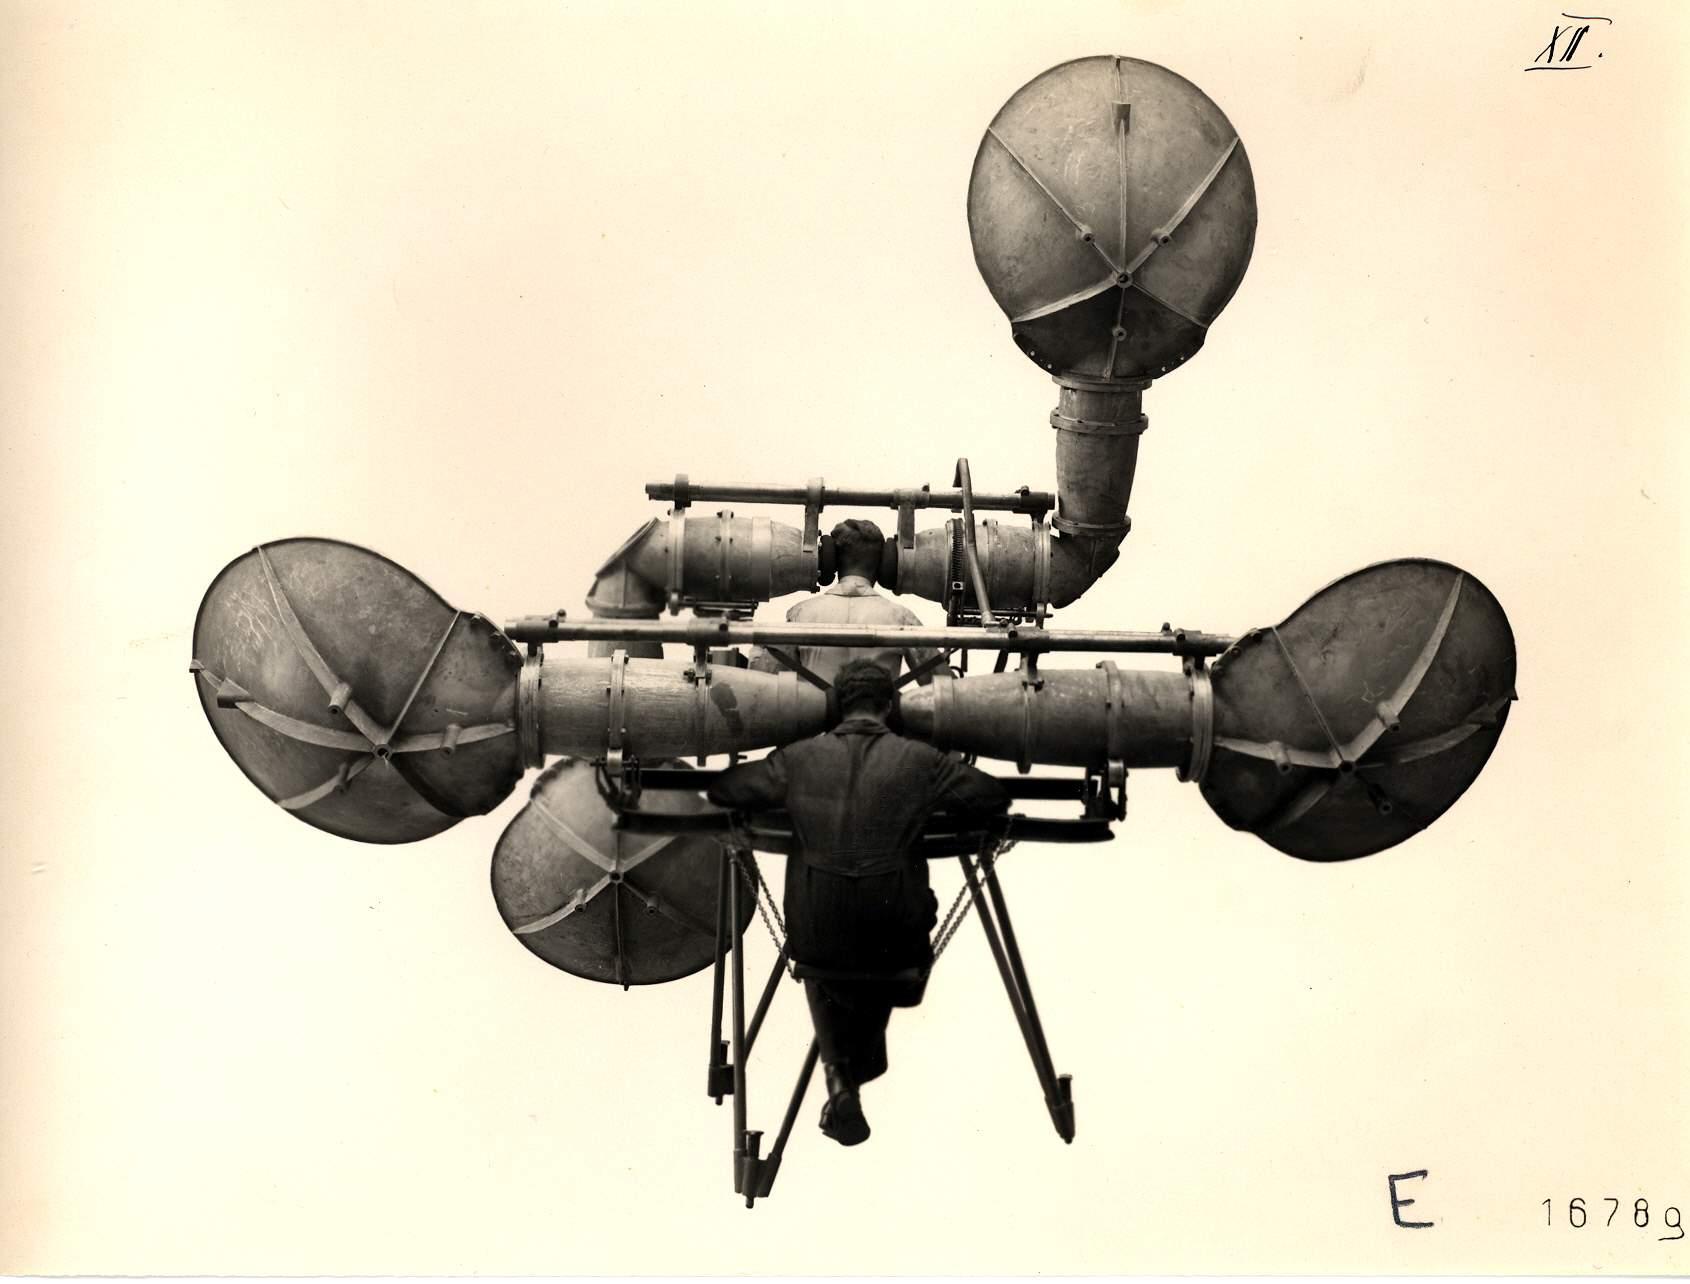 The bulky listening device by Goertz